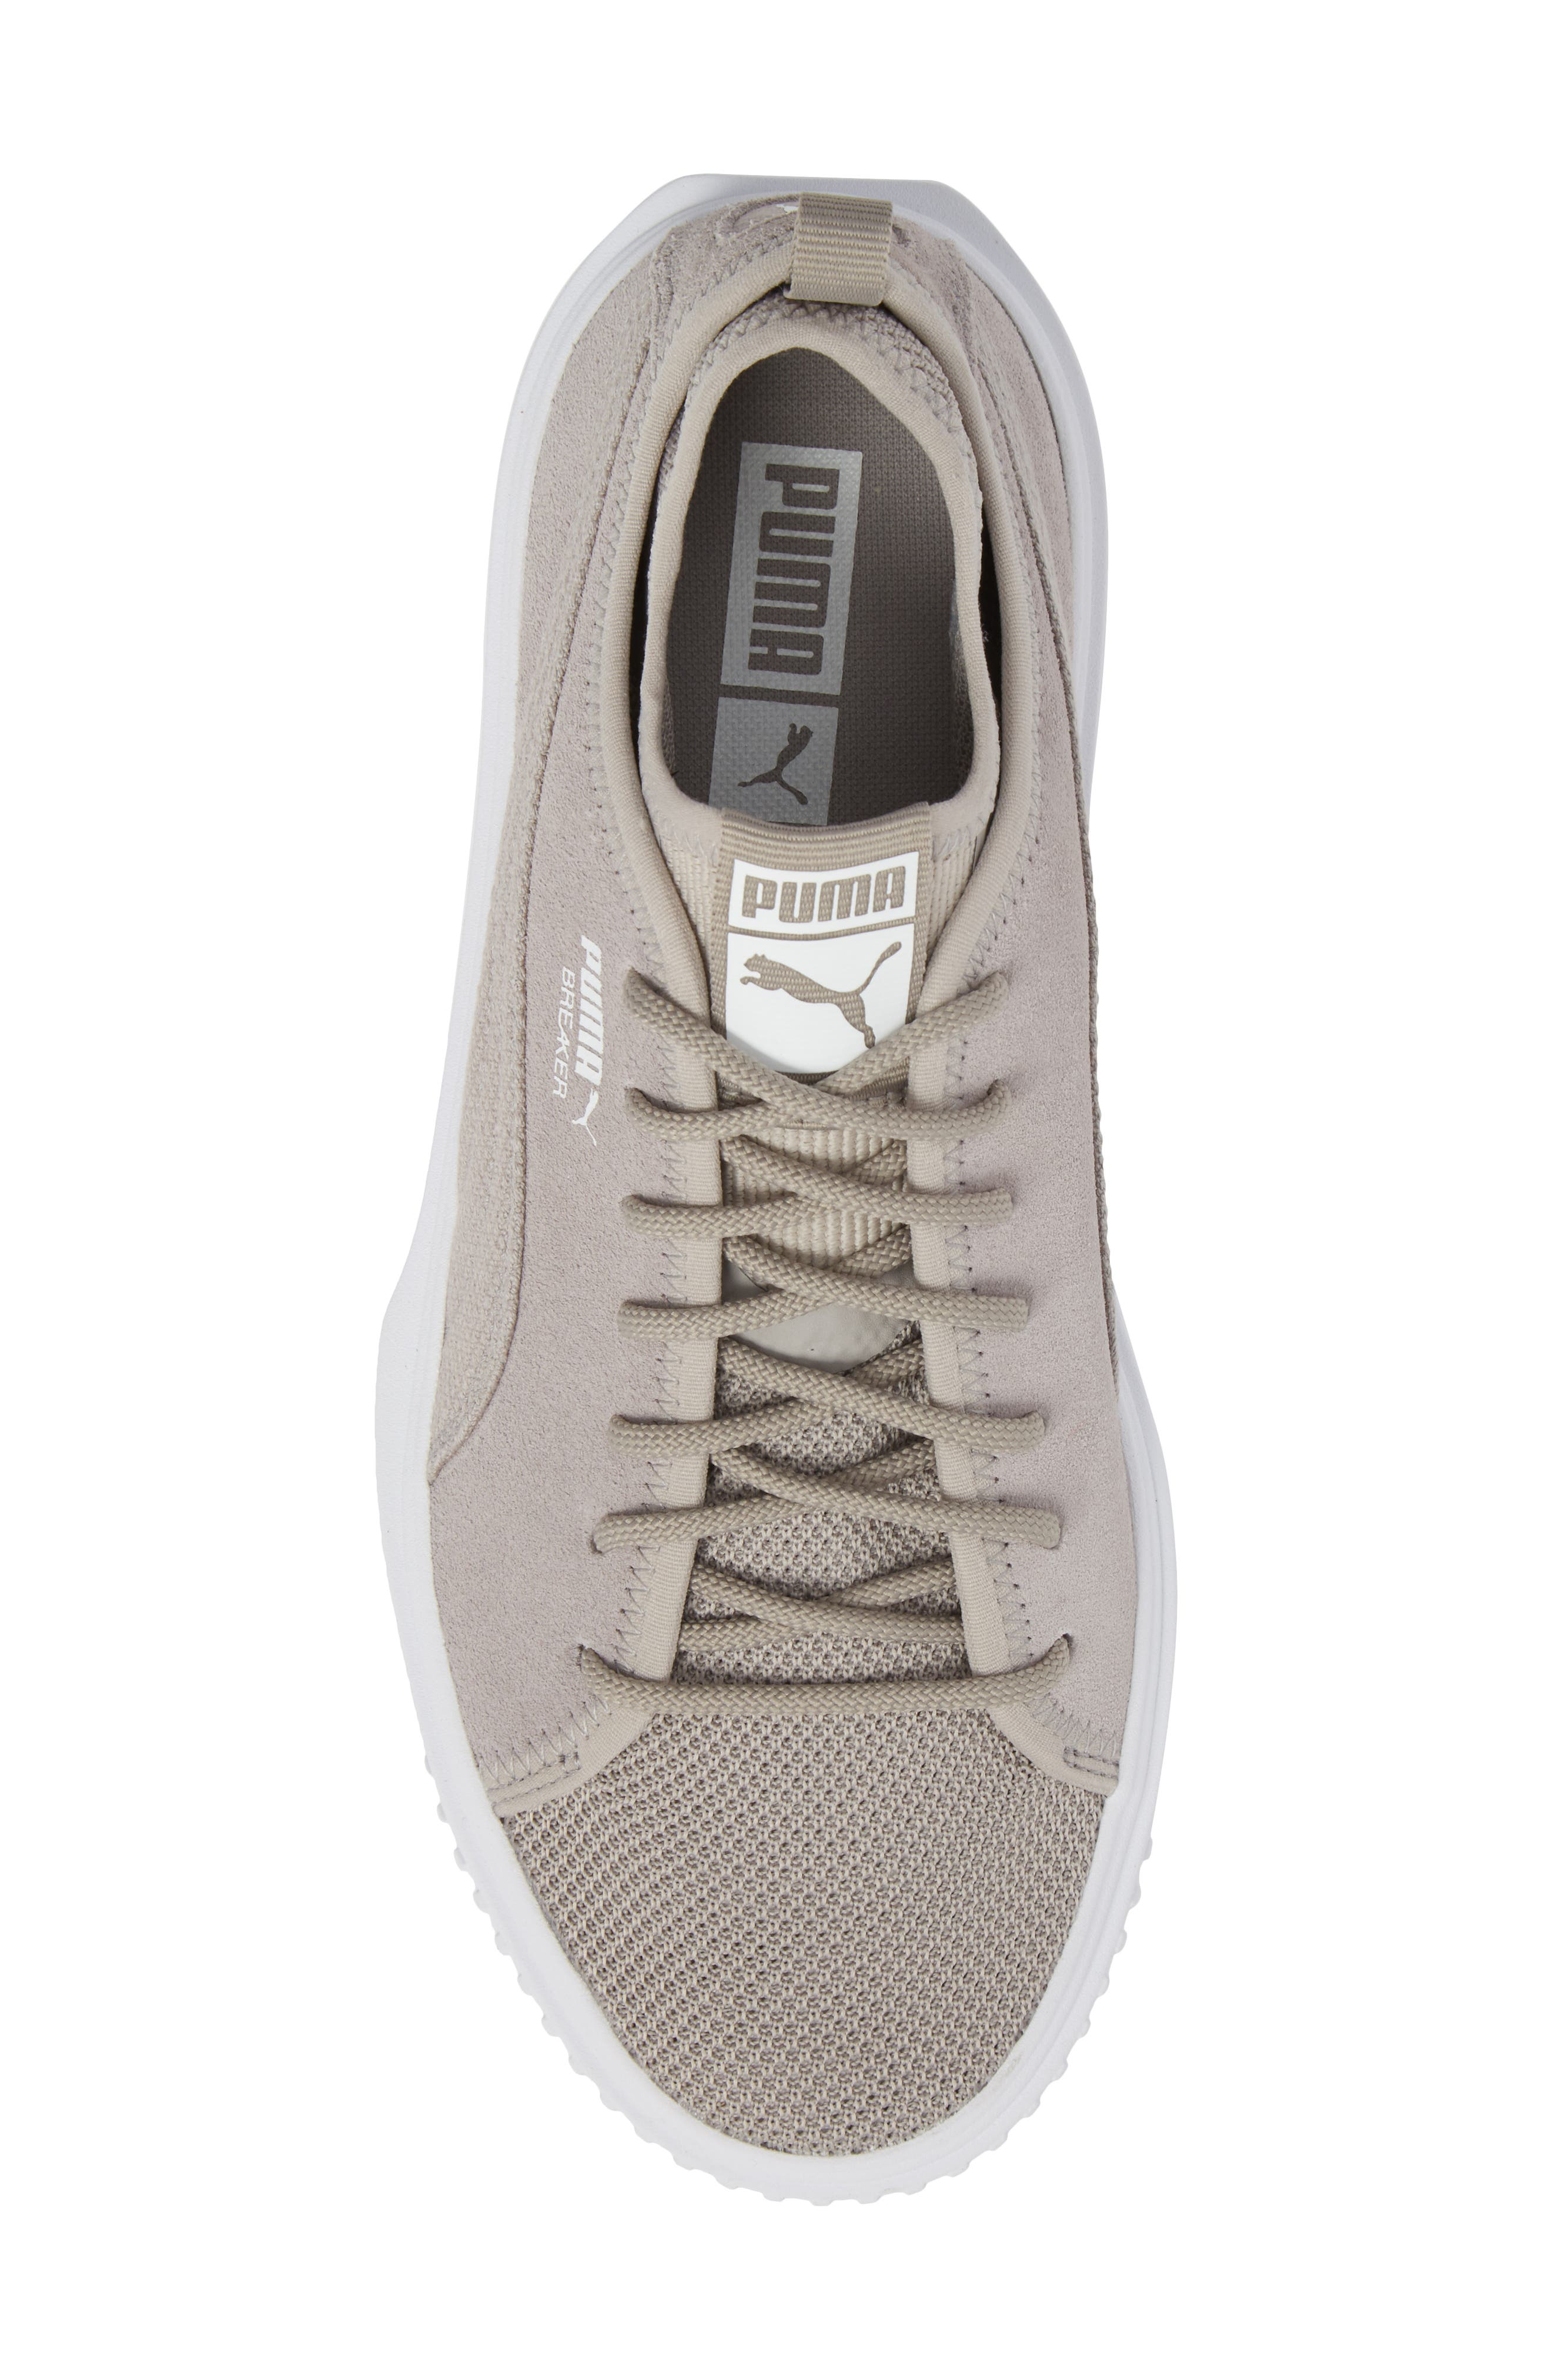 Breaker Mesh Sneaker,                             Alternate thumbnail 5, color,                             Ash/ White Suede